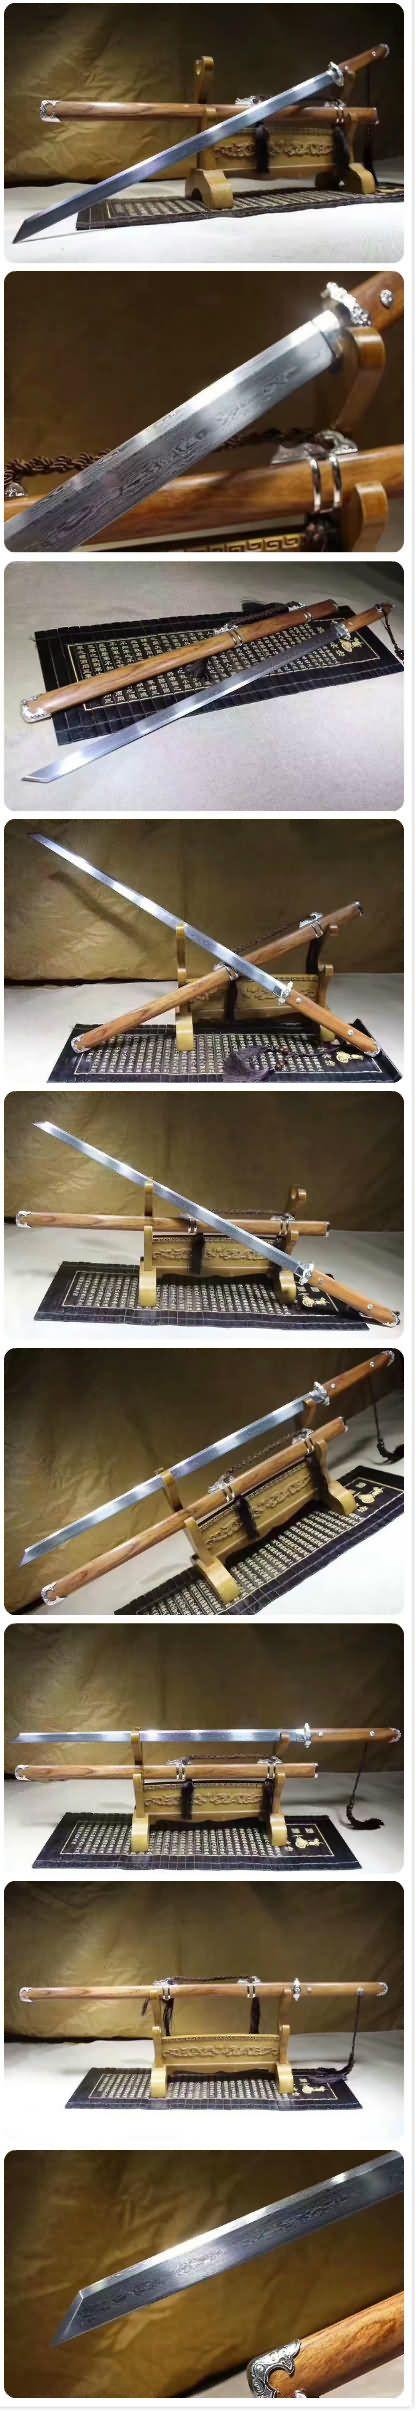 https://www.chinese-sword.com/